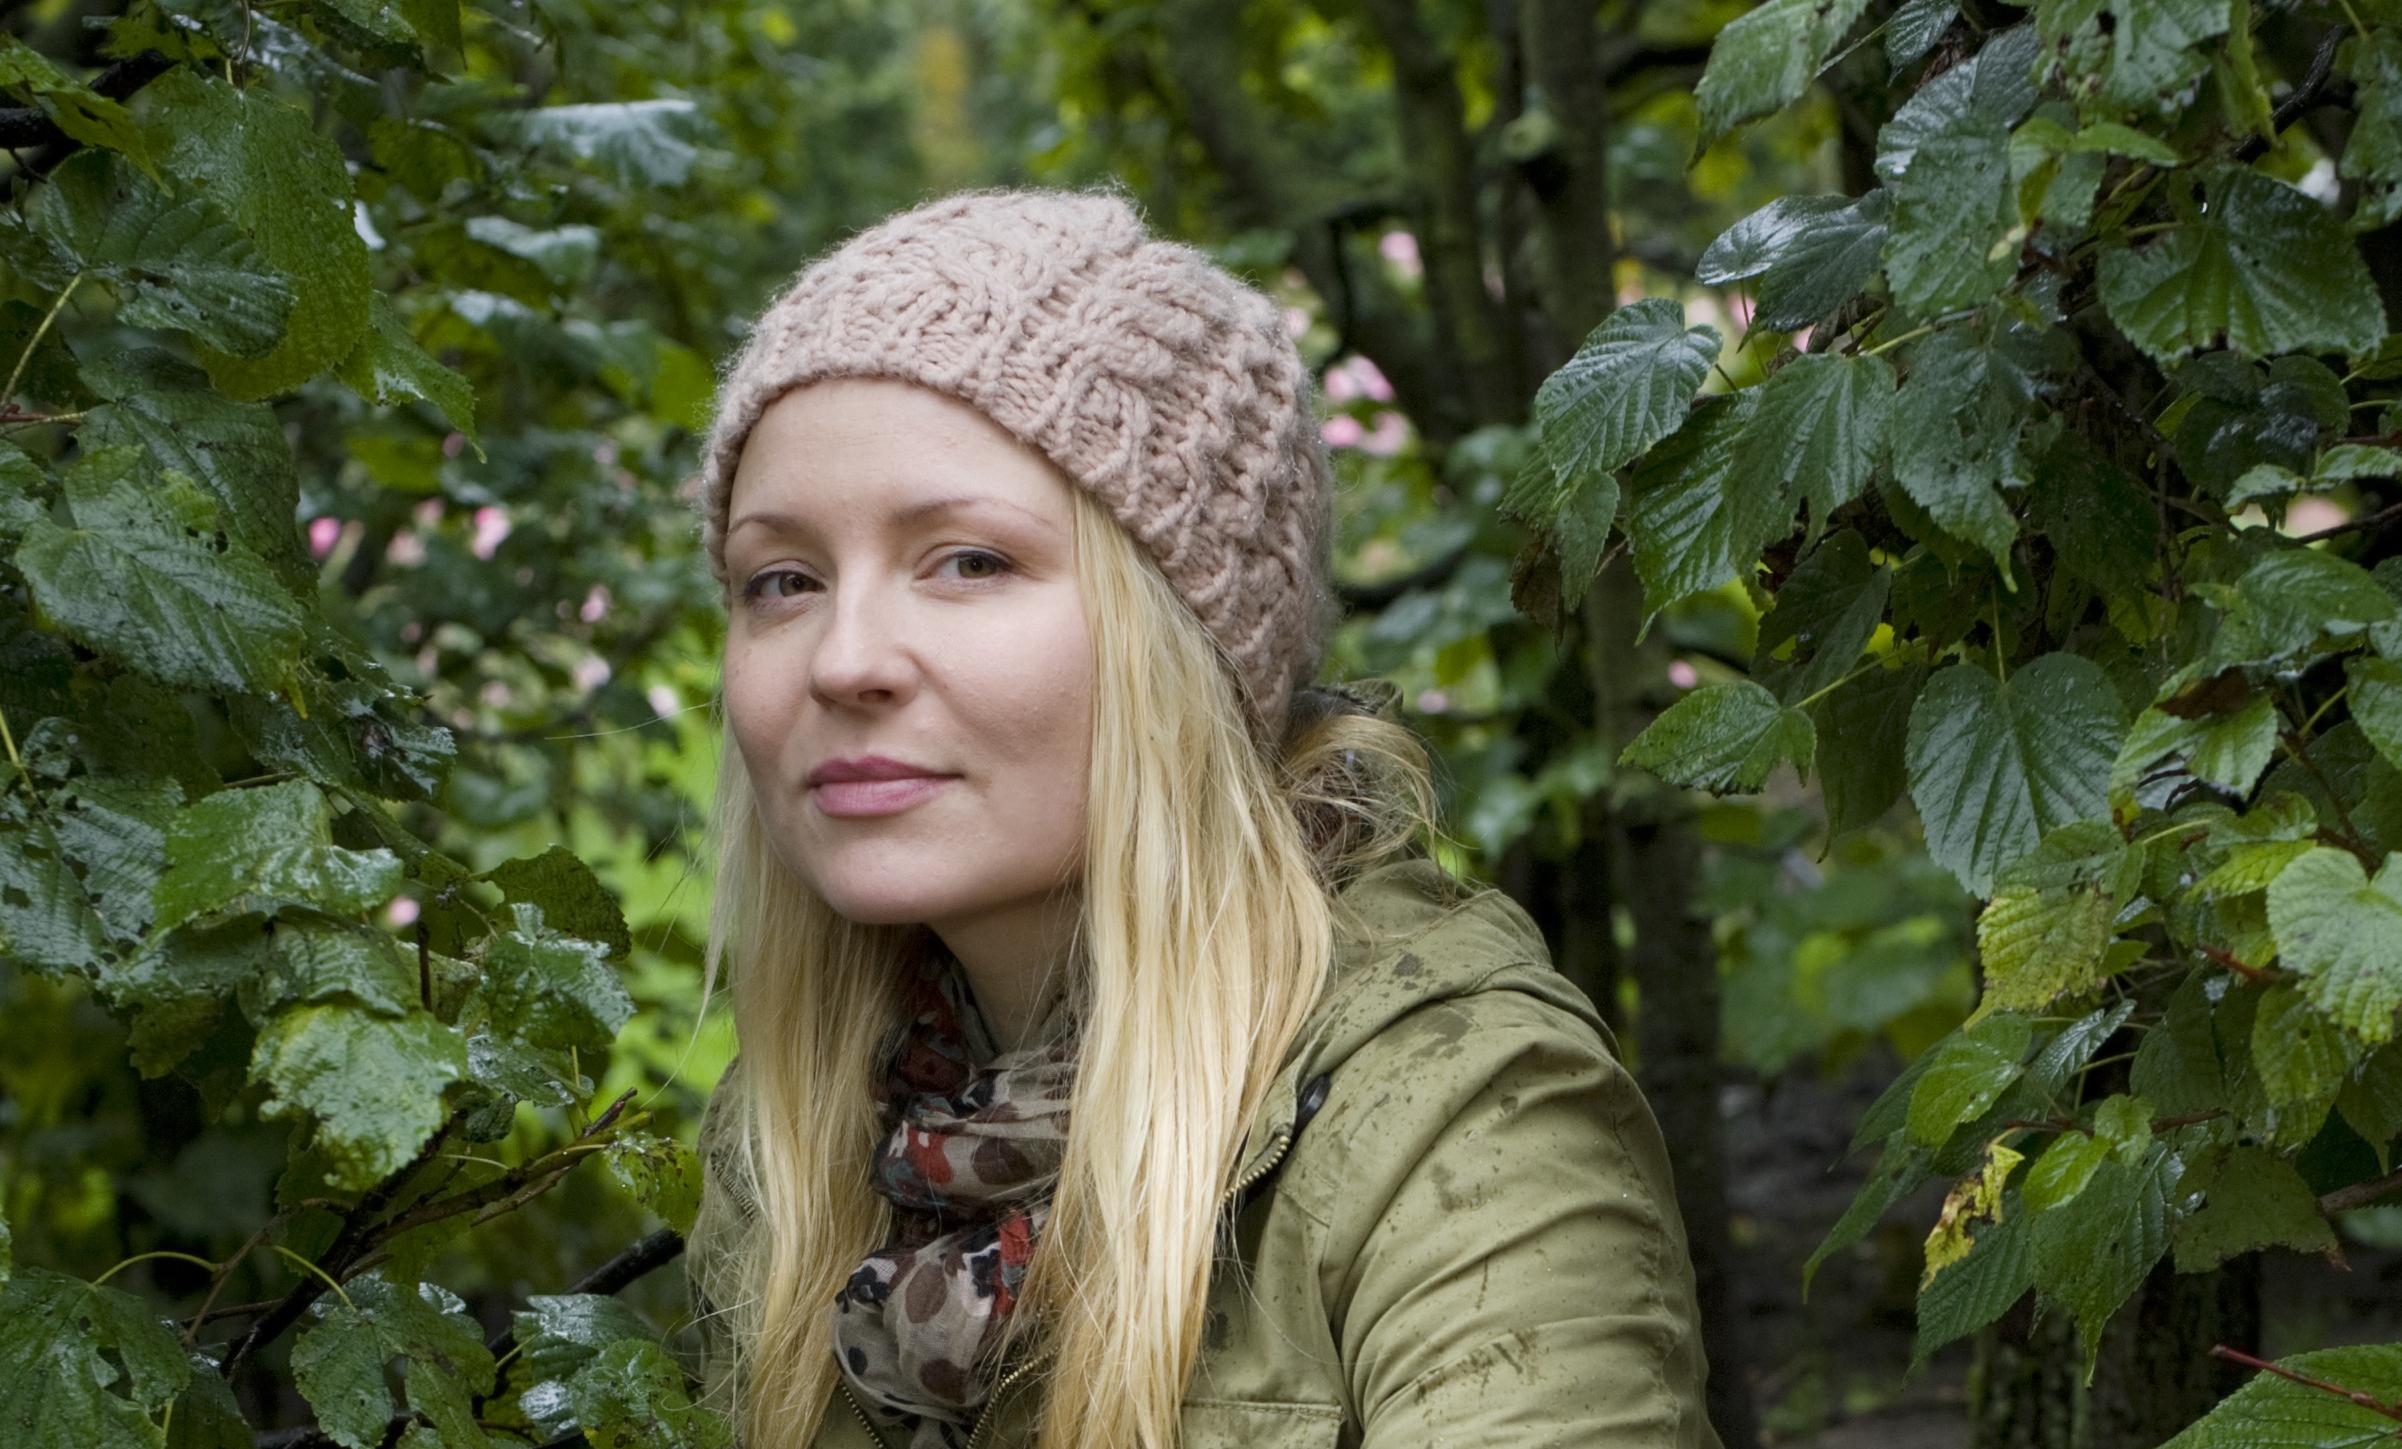 Director Katja Gauriloff